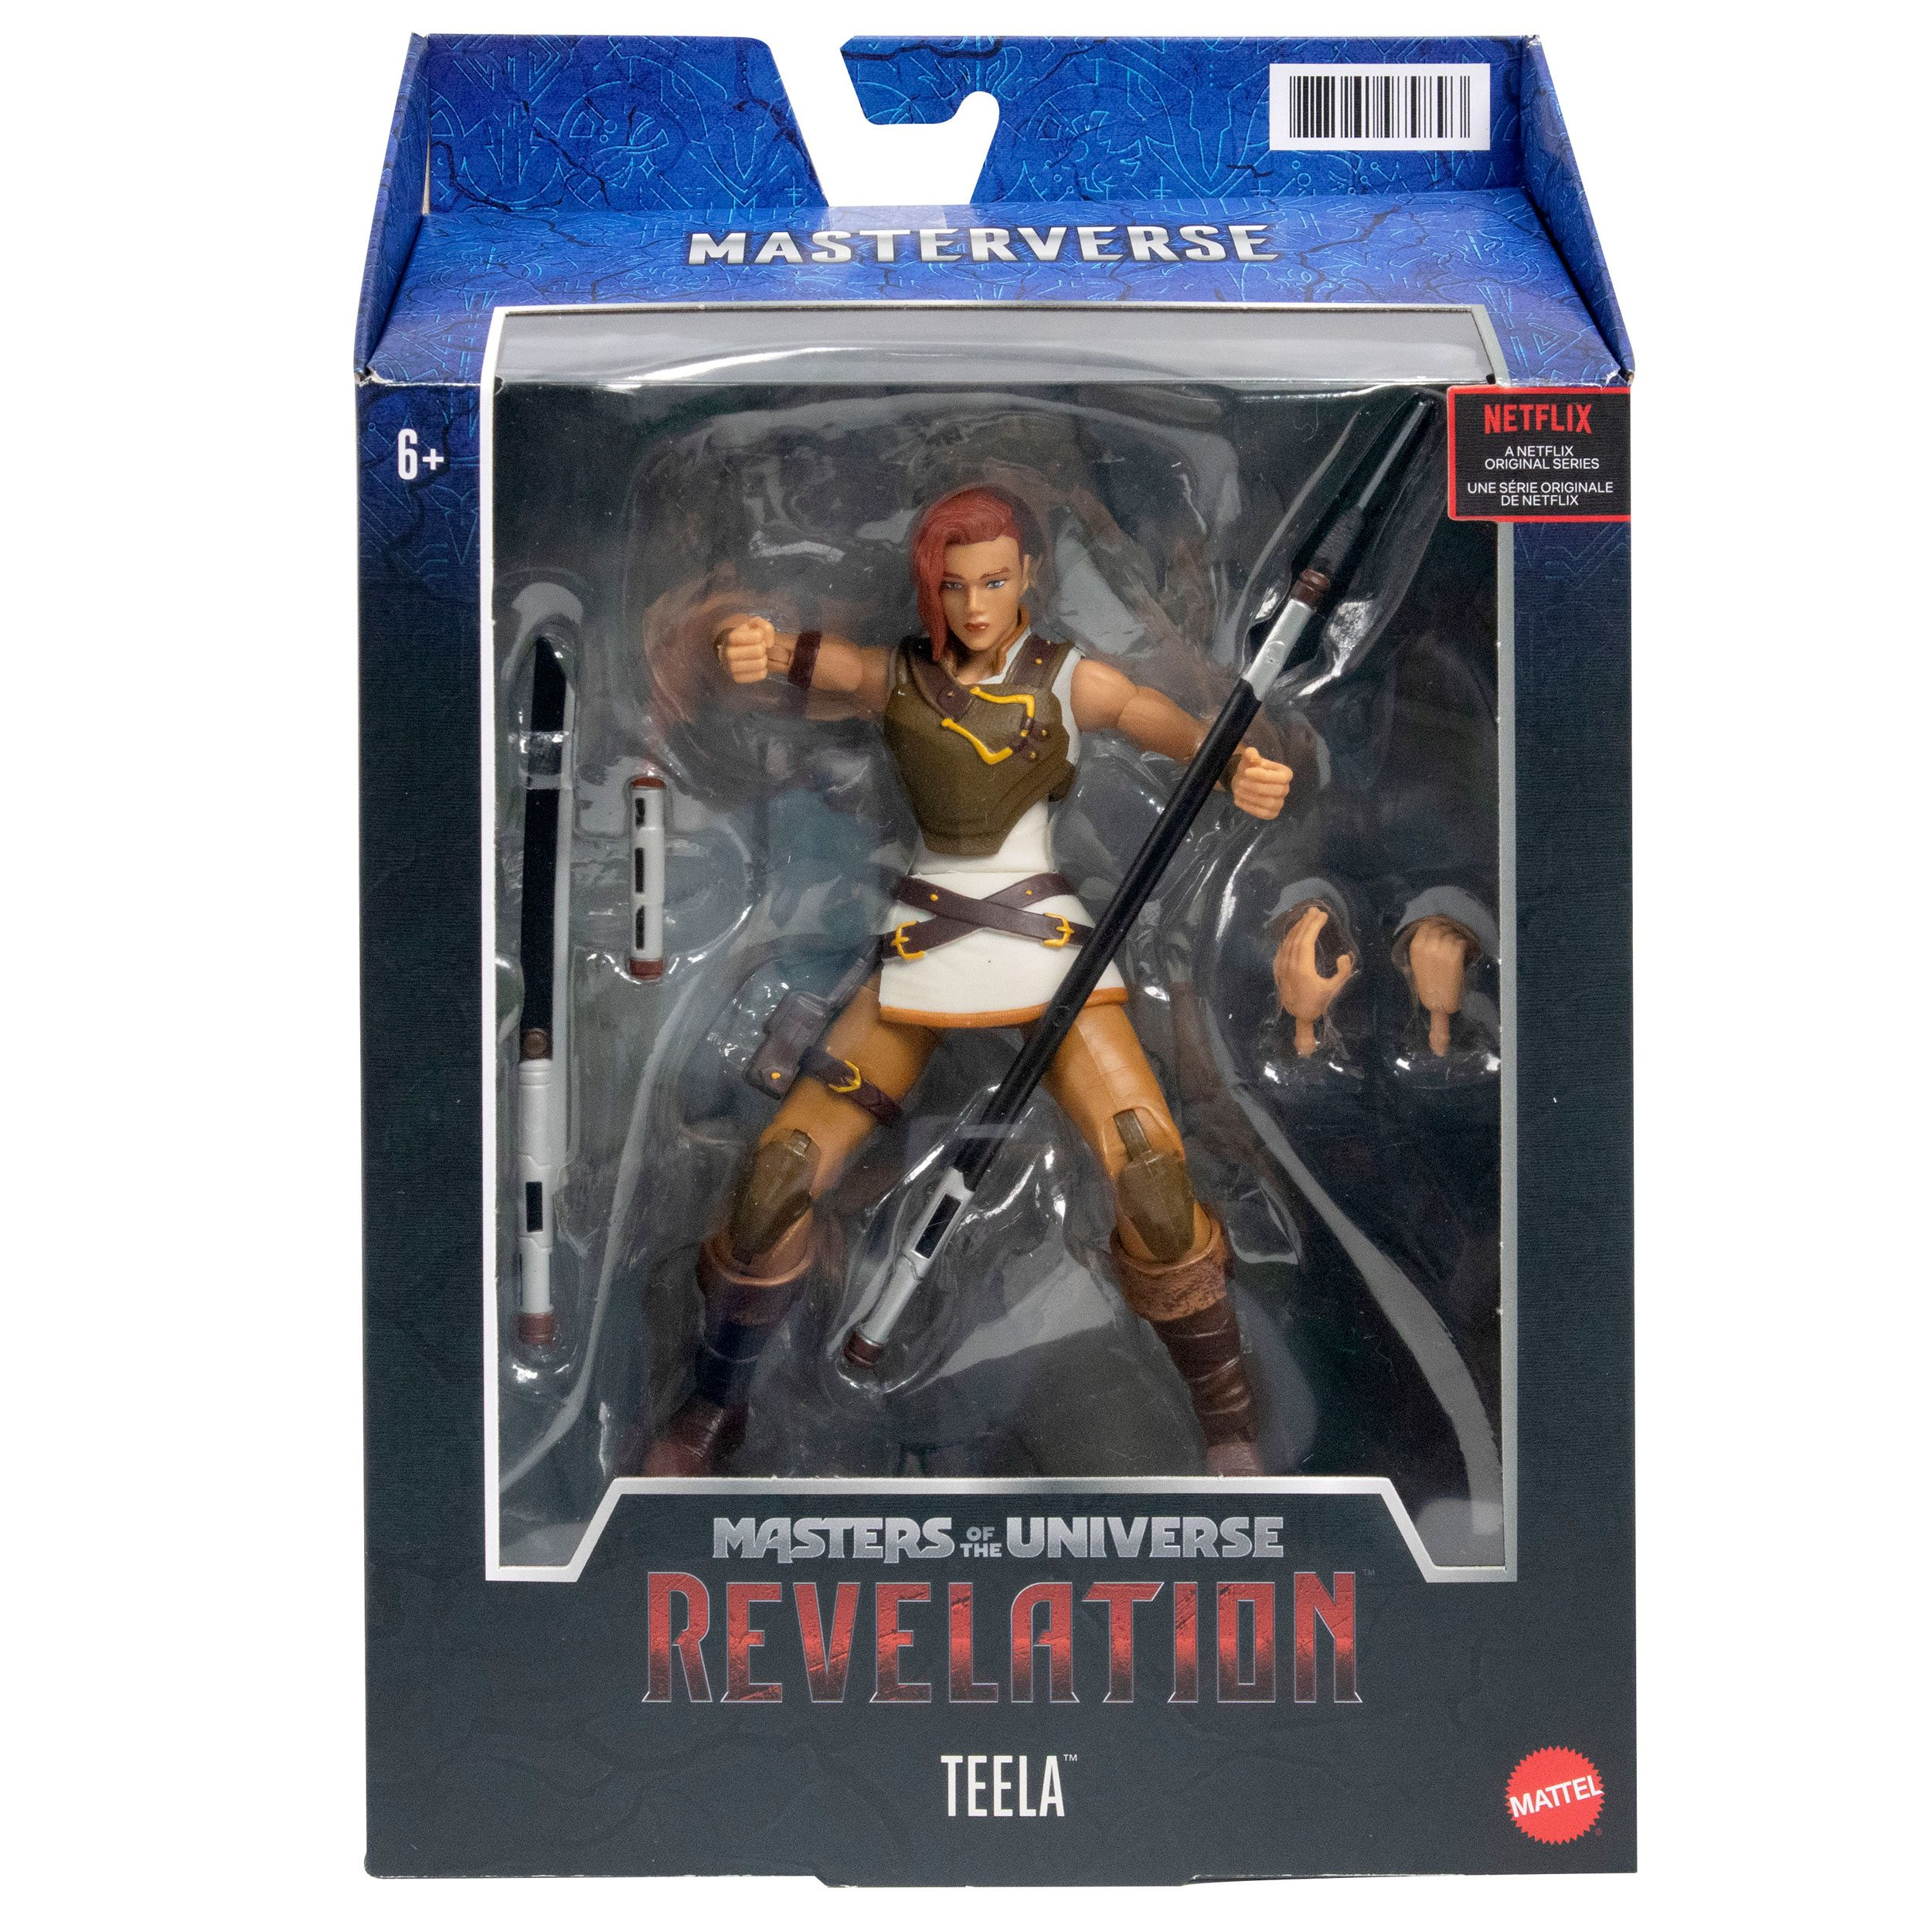 Masters of the Universe: Revelation Masterverse Actionfigur 2021 Teela 18 cm MATTGYV15 0887961979893